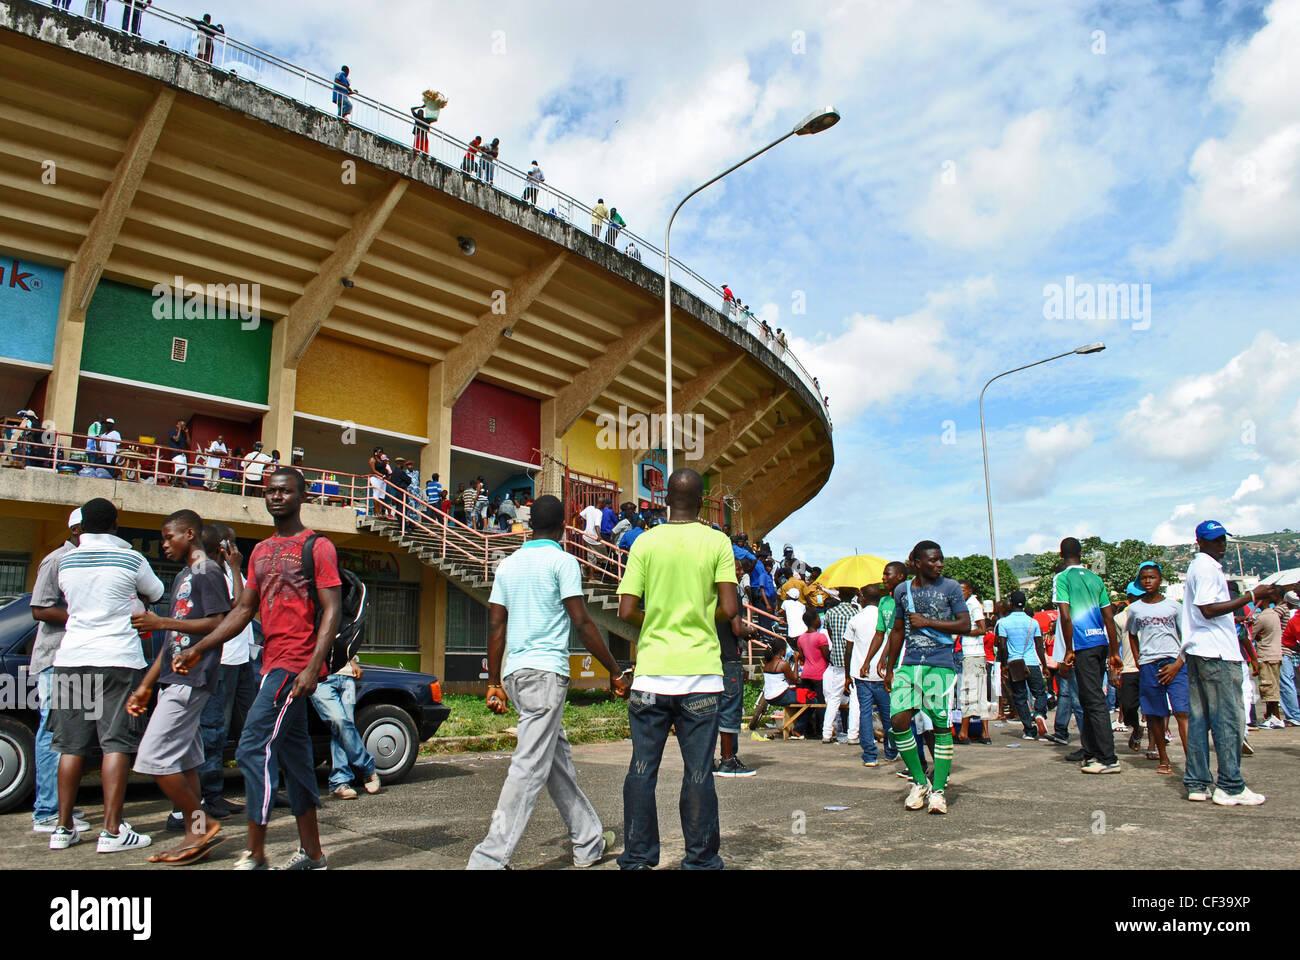 National football stadium in Freetown, Sierra Leone - Stock Image